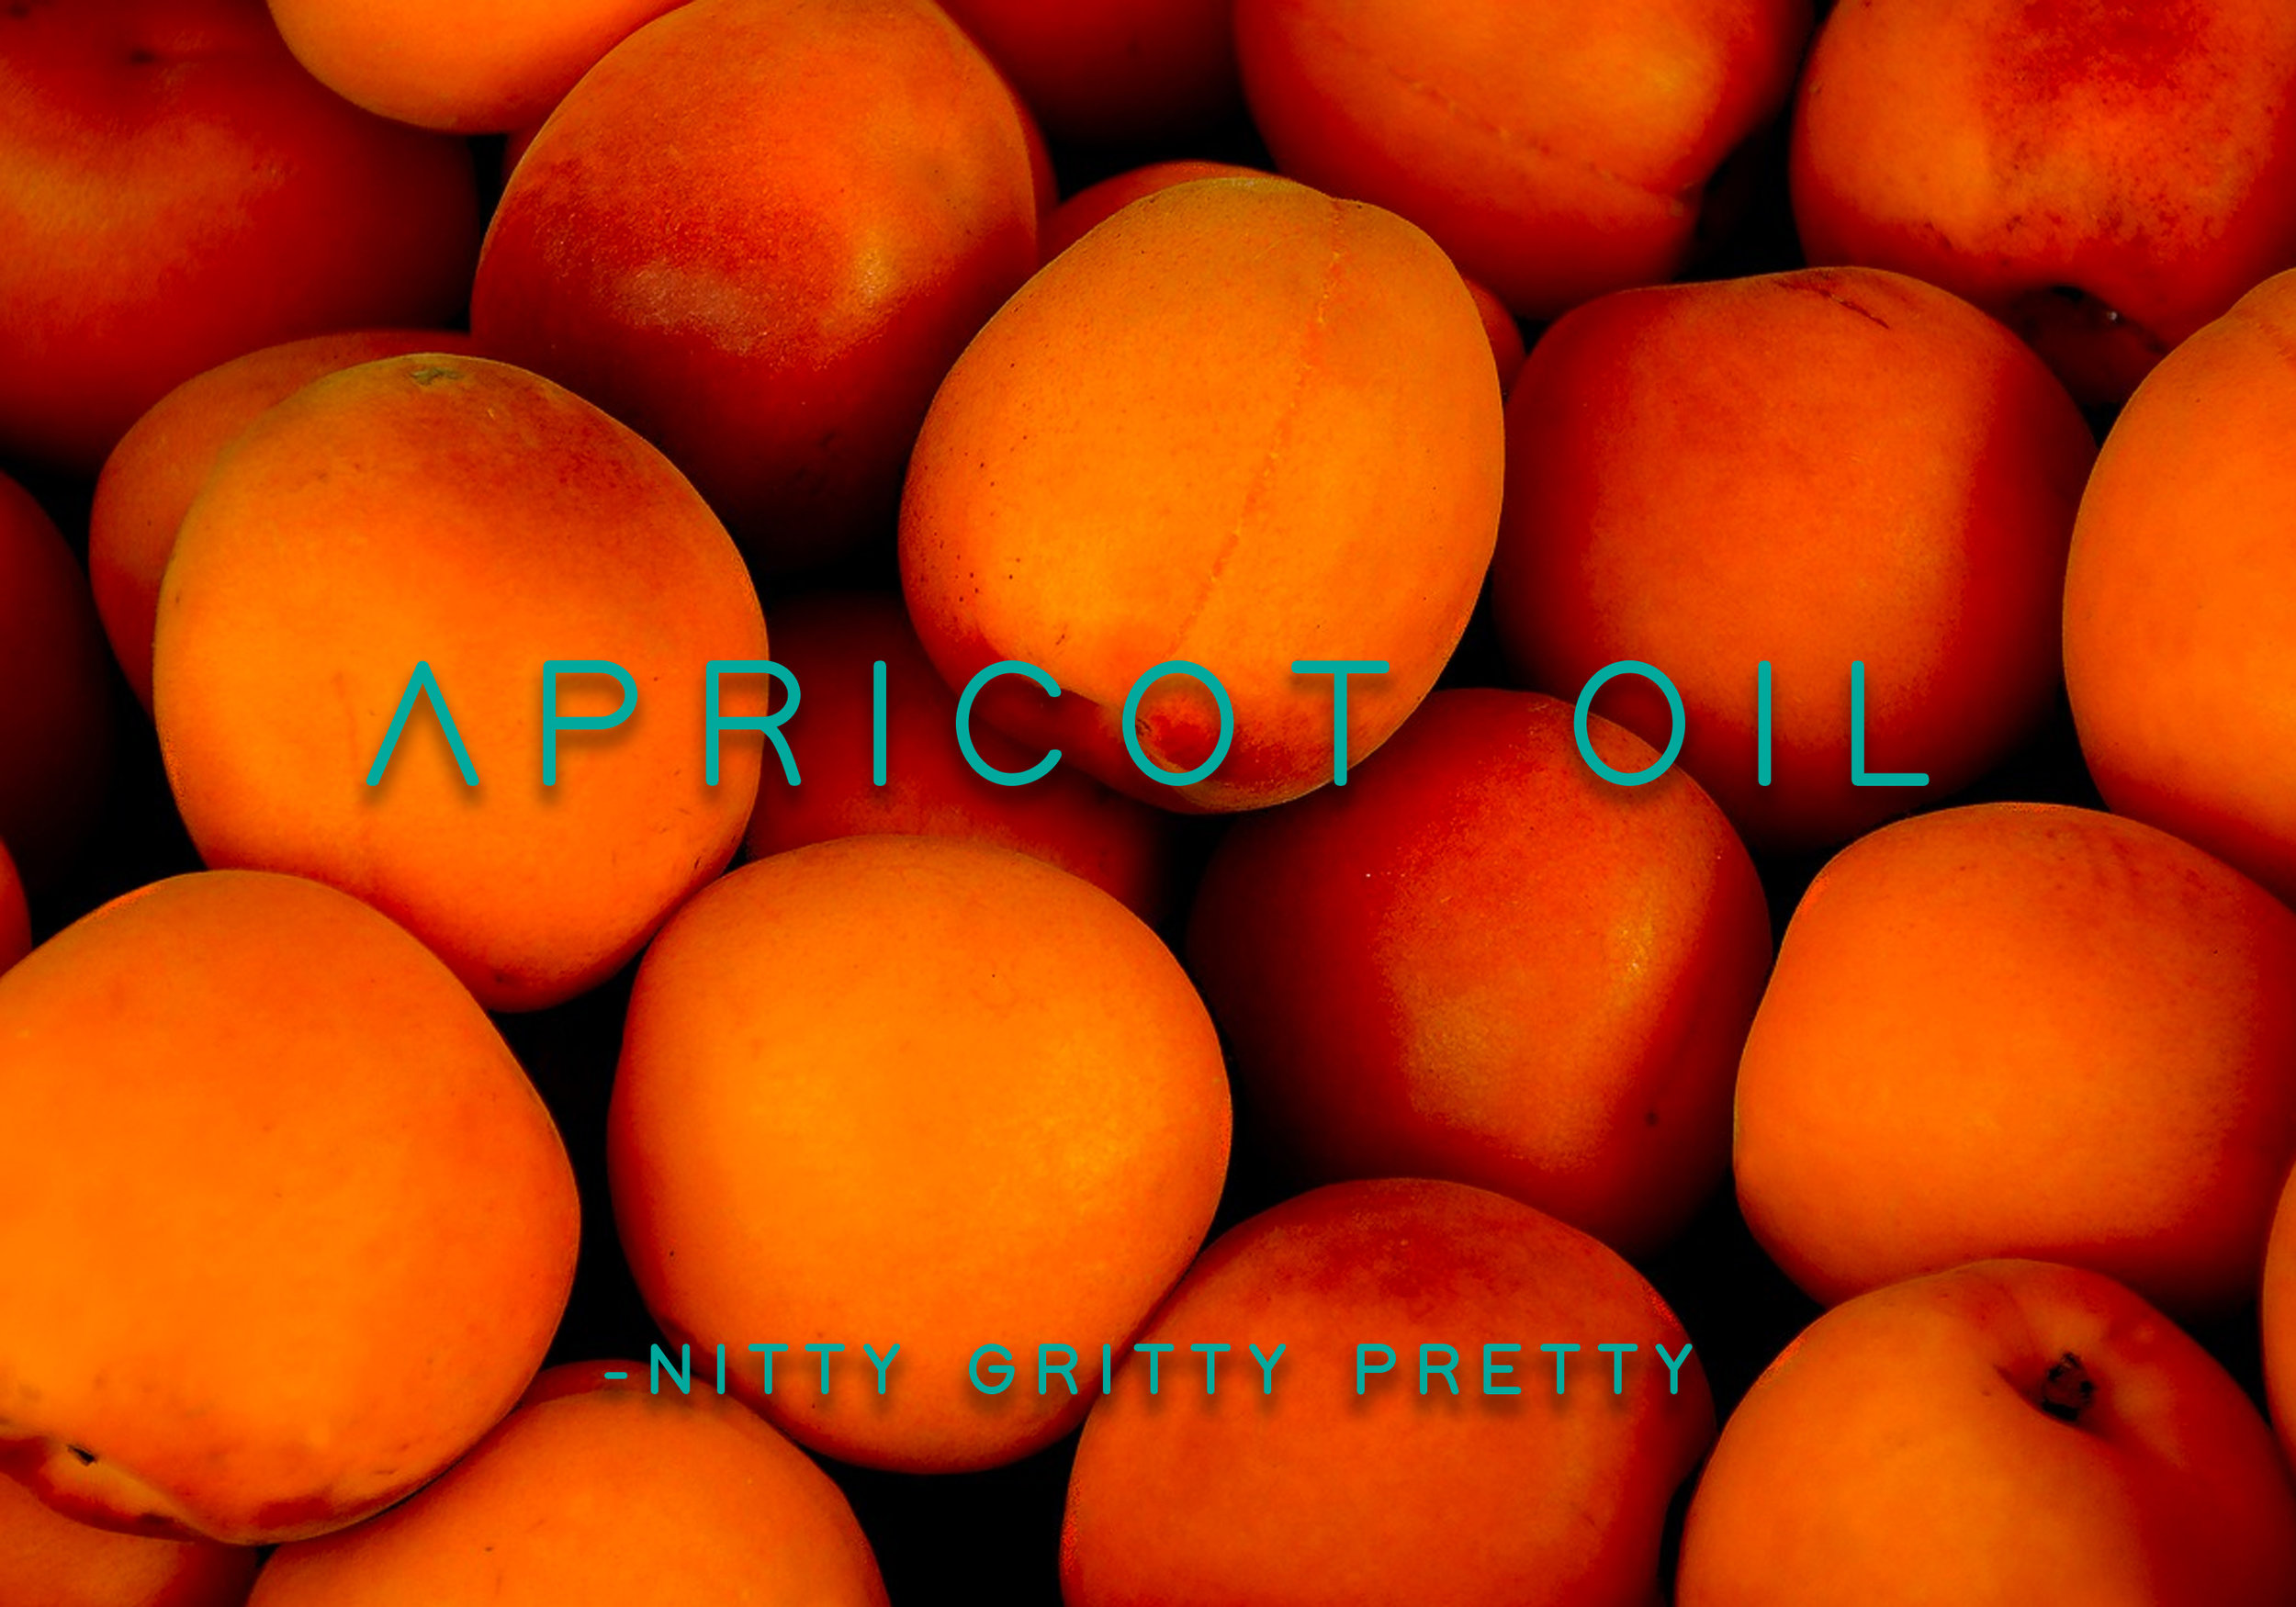 apricot oil.jpg